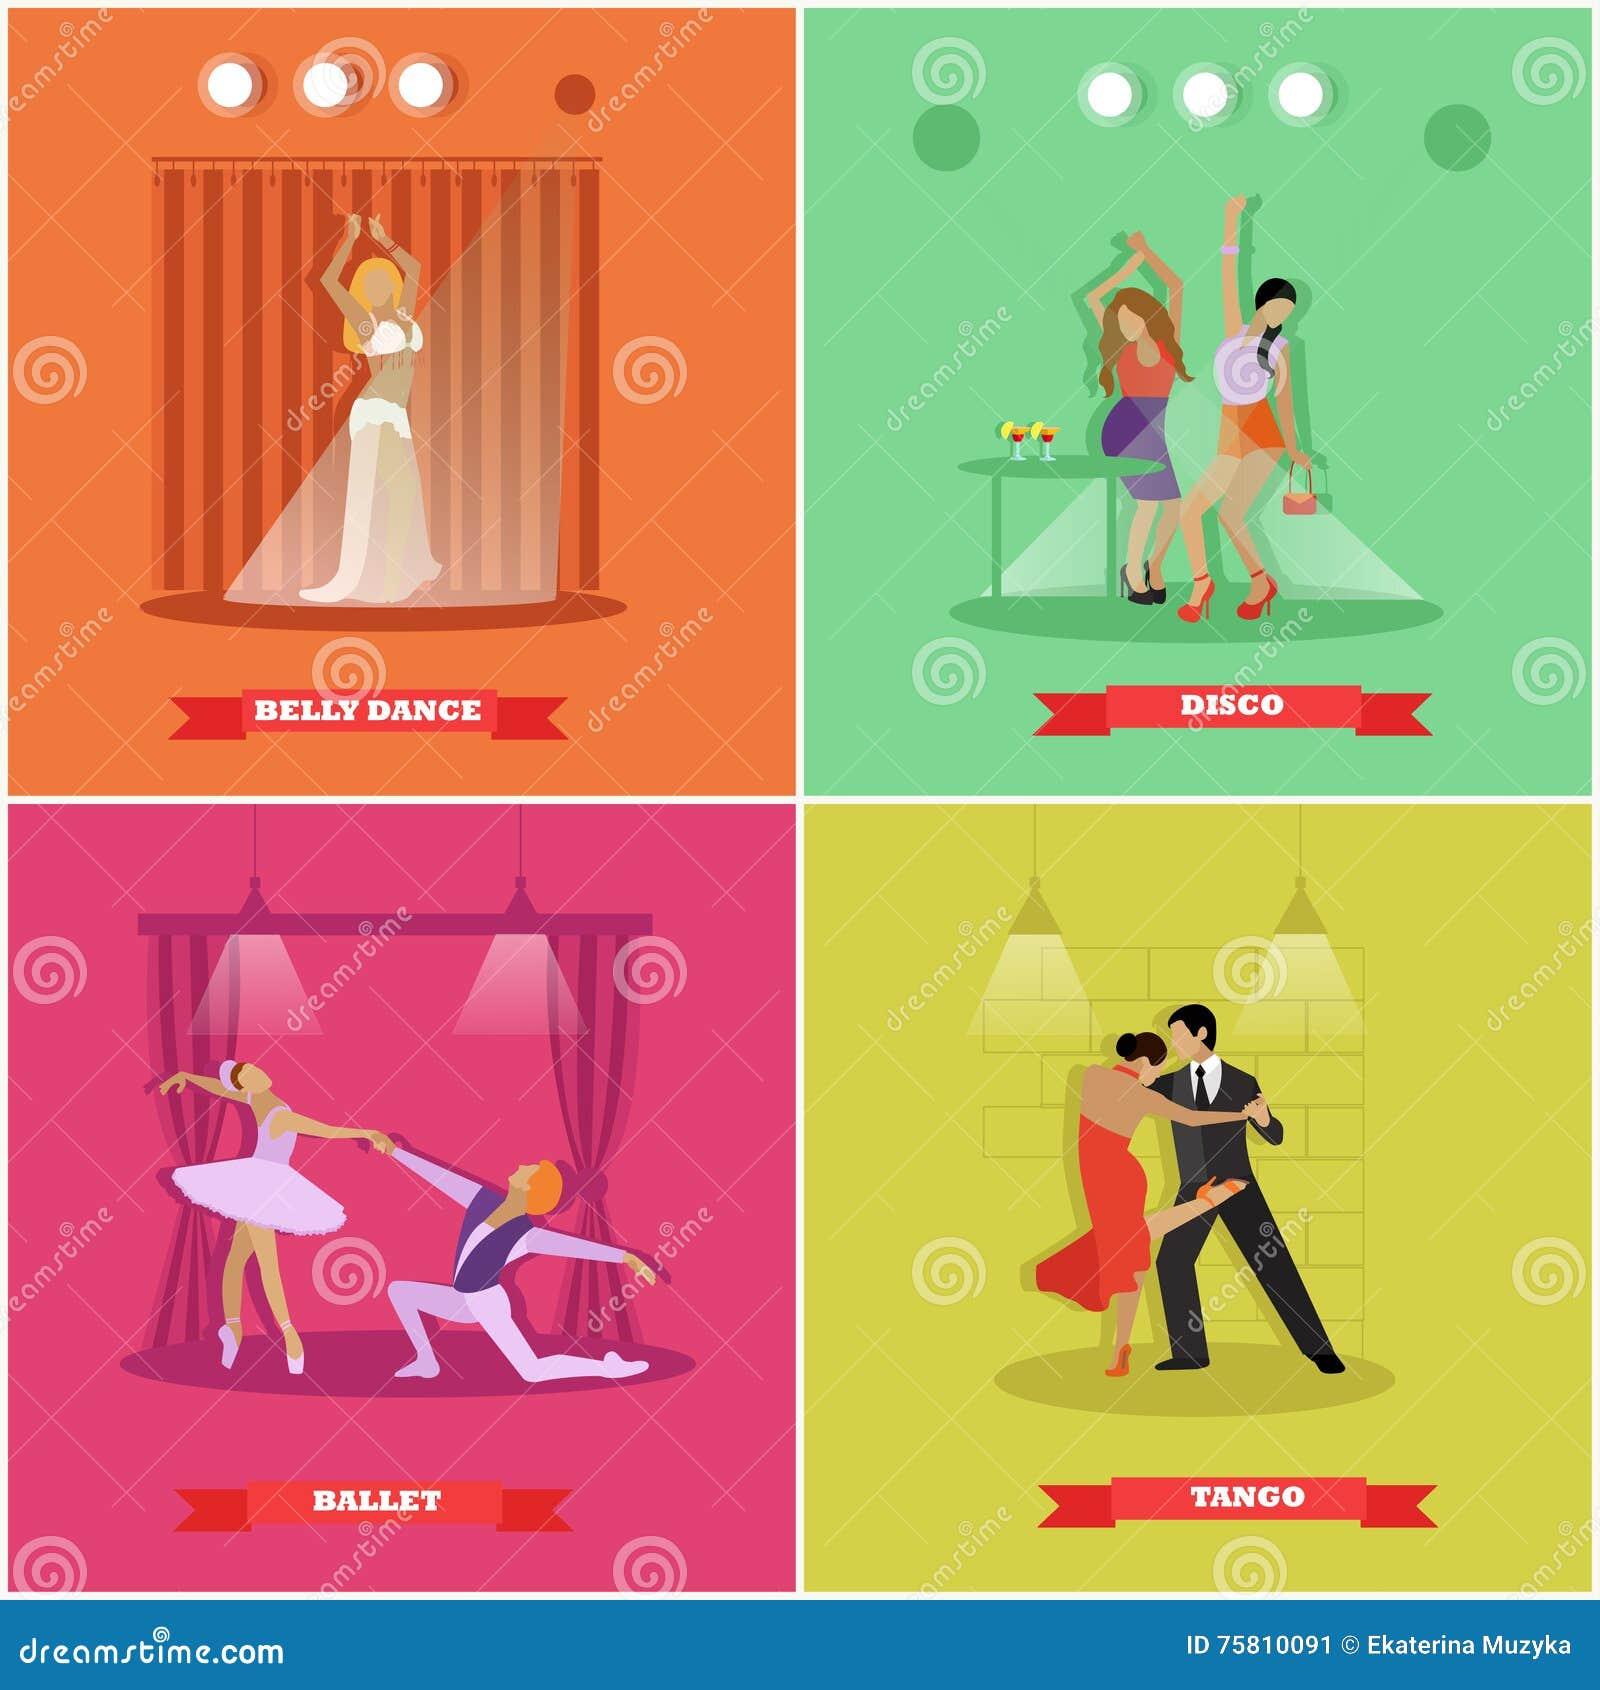 tango app leute kennenlernen top fragen zum kennenlernen